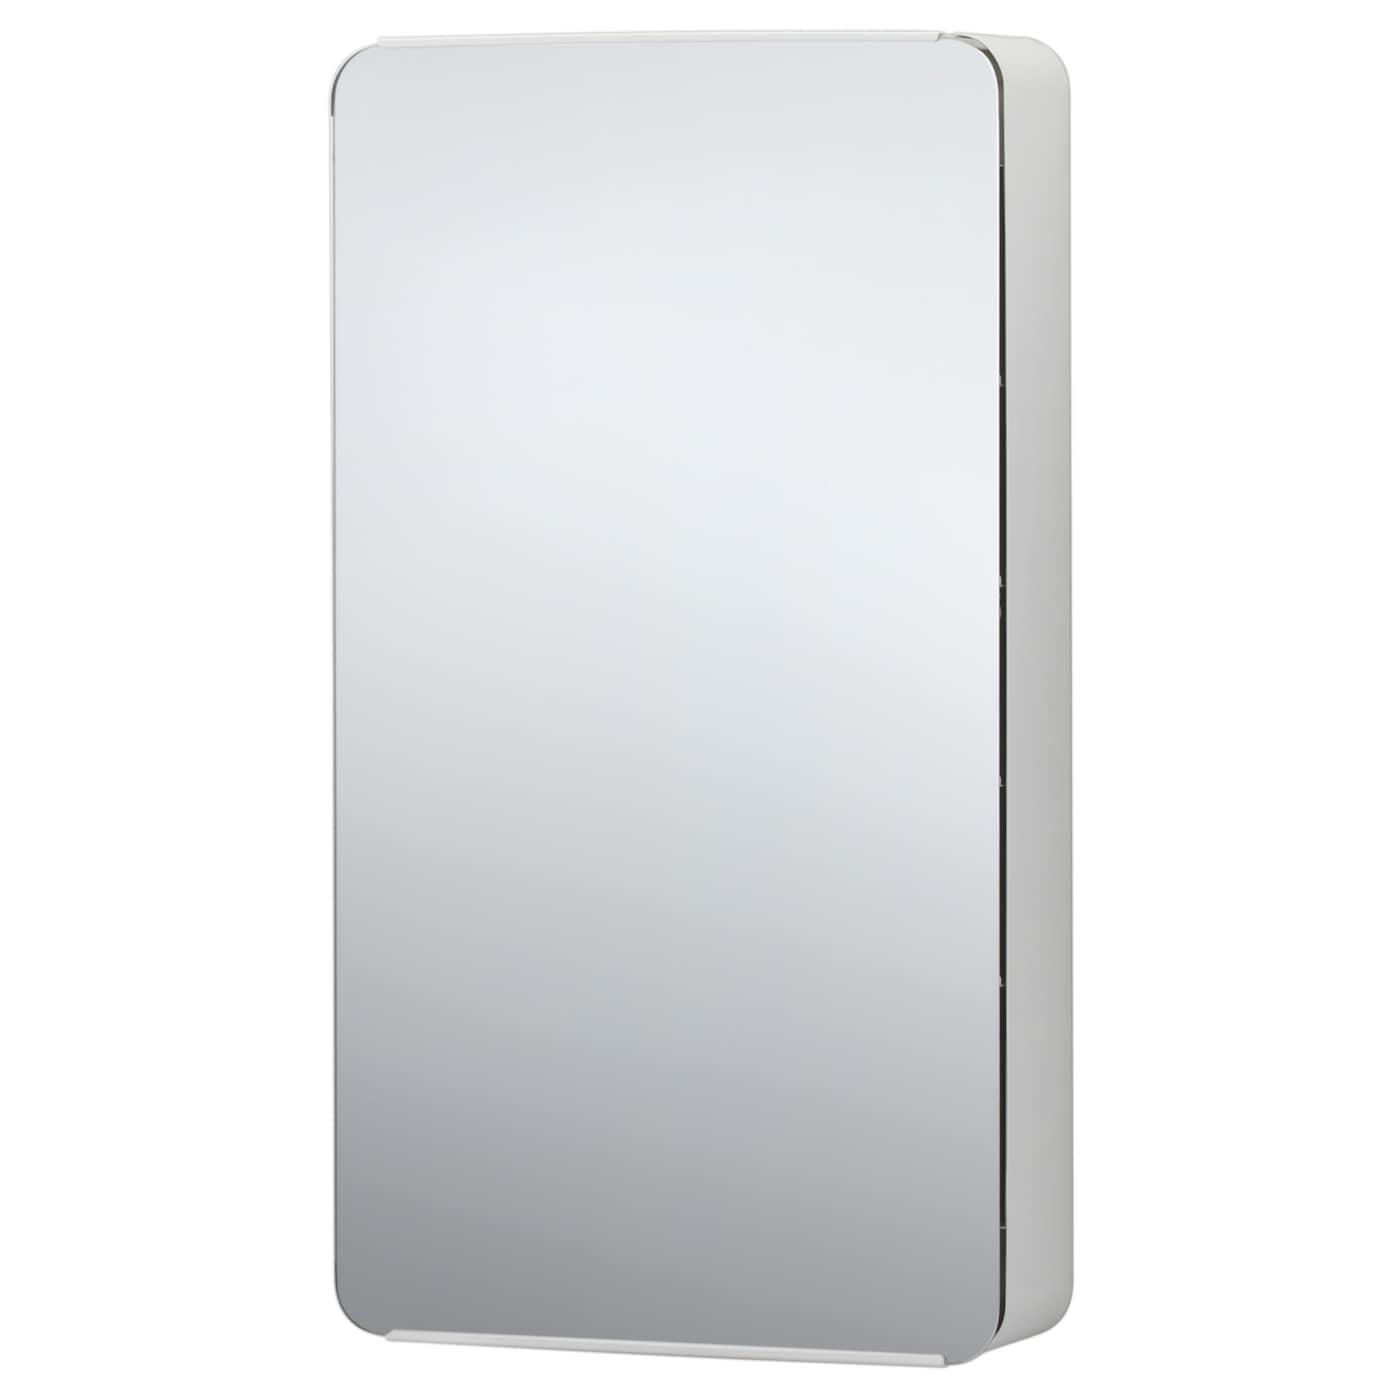 Brickan miroir avec rangement blanc 20x100 cm ikea for Miroir salle de bain ikea